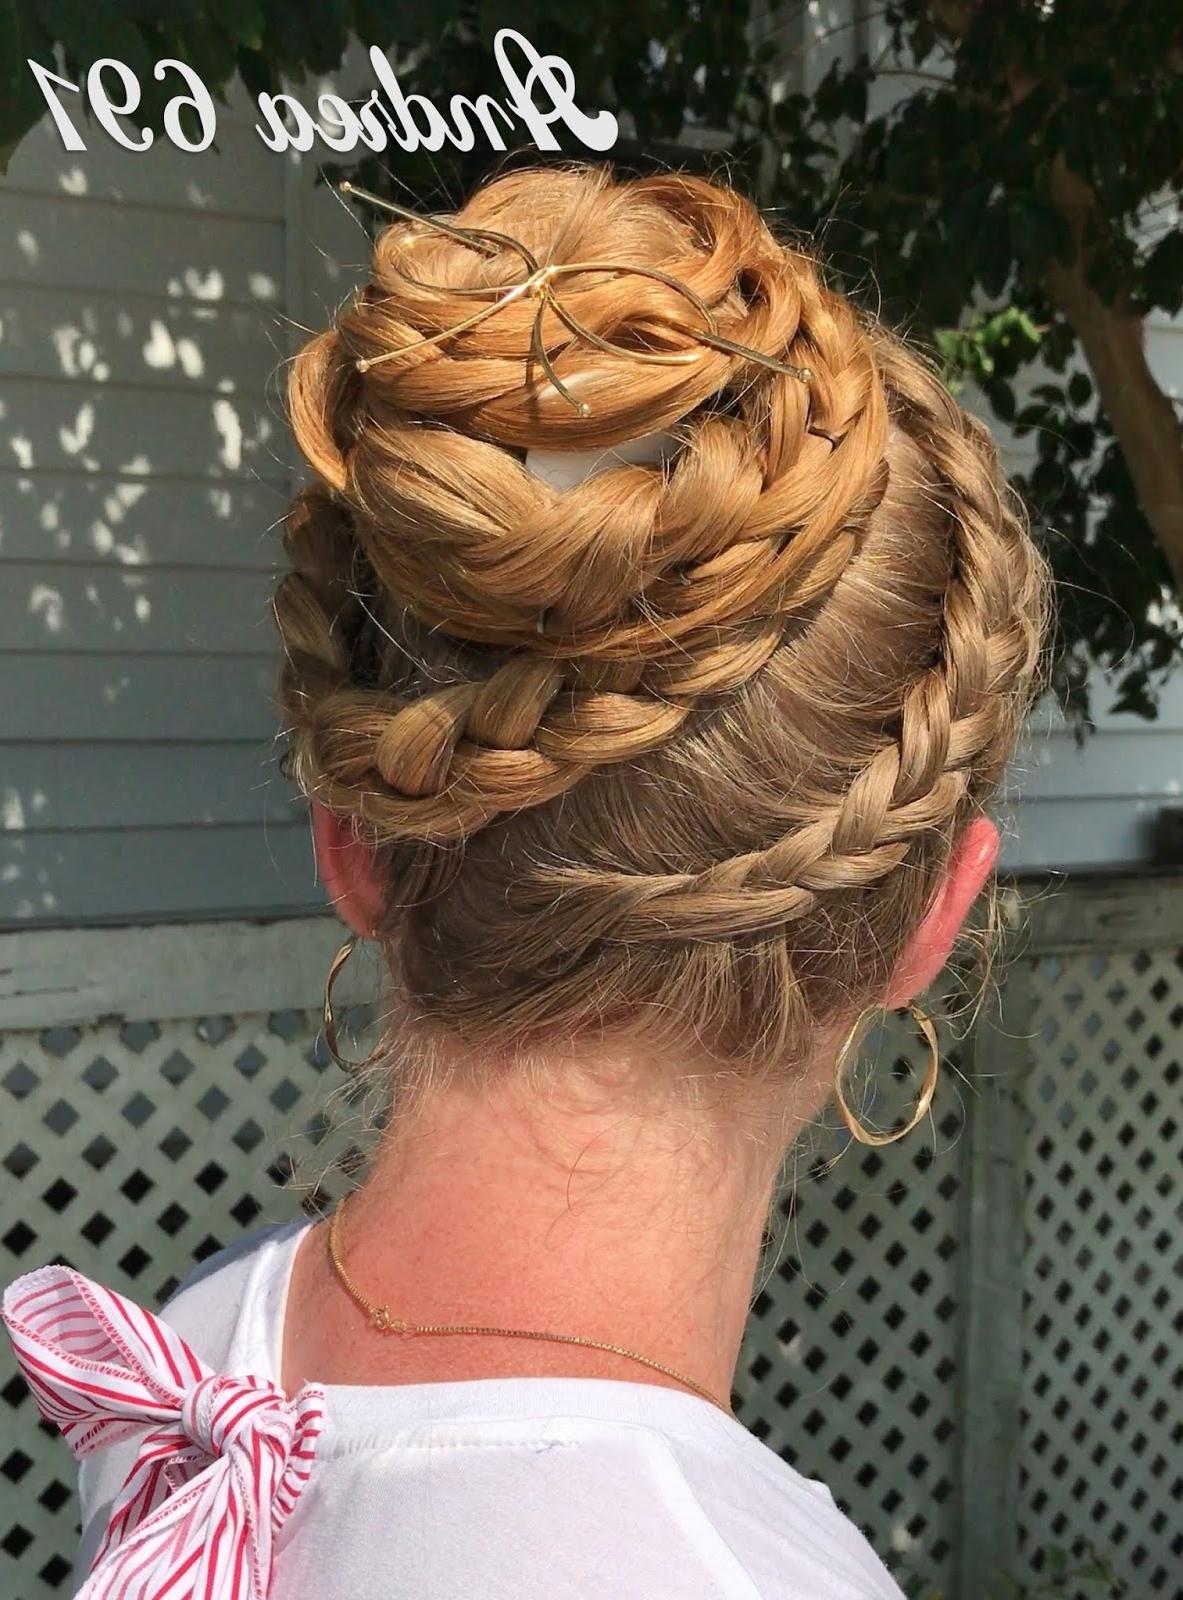 Current Spiraled Wedding Updos Regarding Braids & Hairstyles For Super Long Hair: Spiraling Braid And Bun (View 14 of 20)